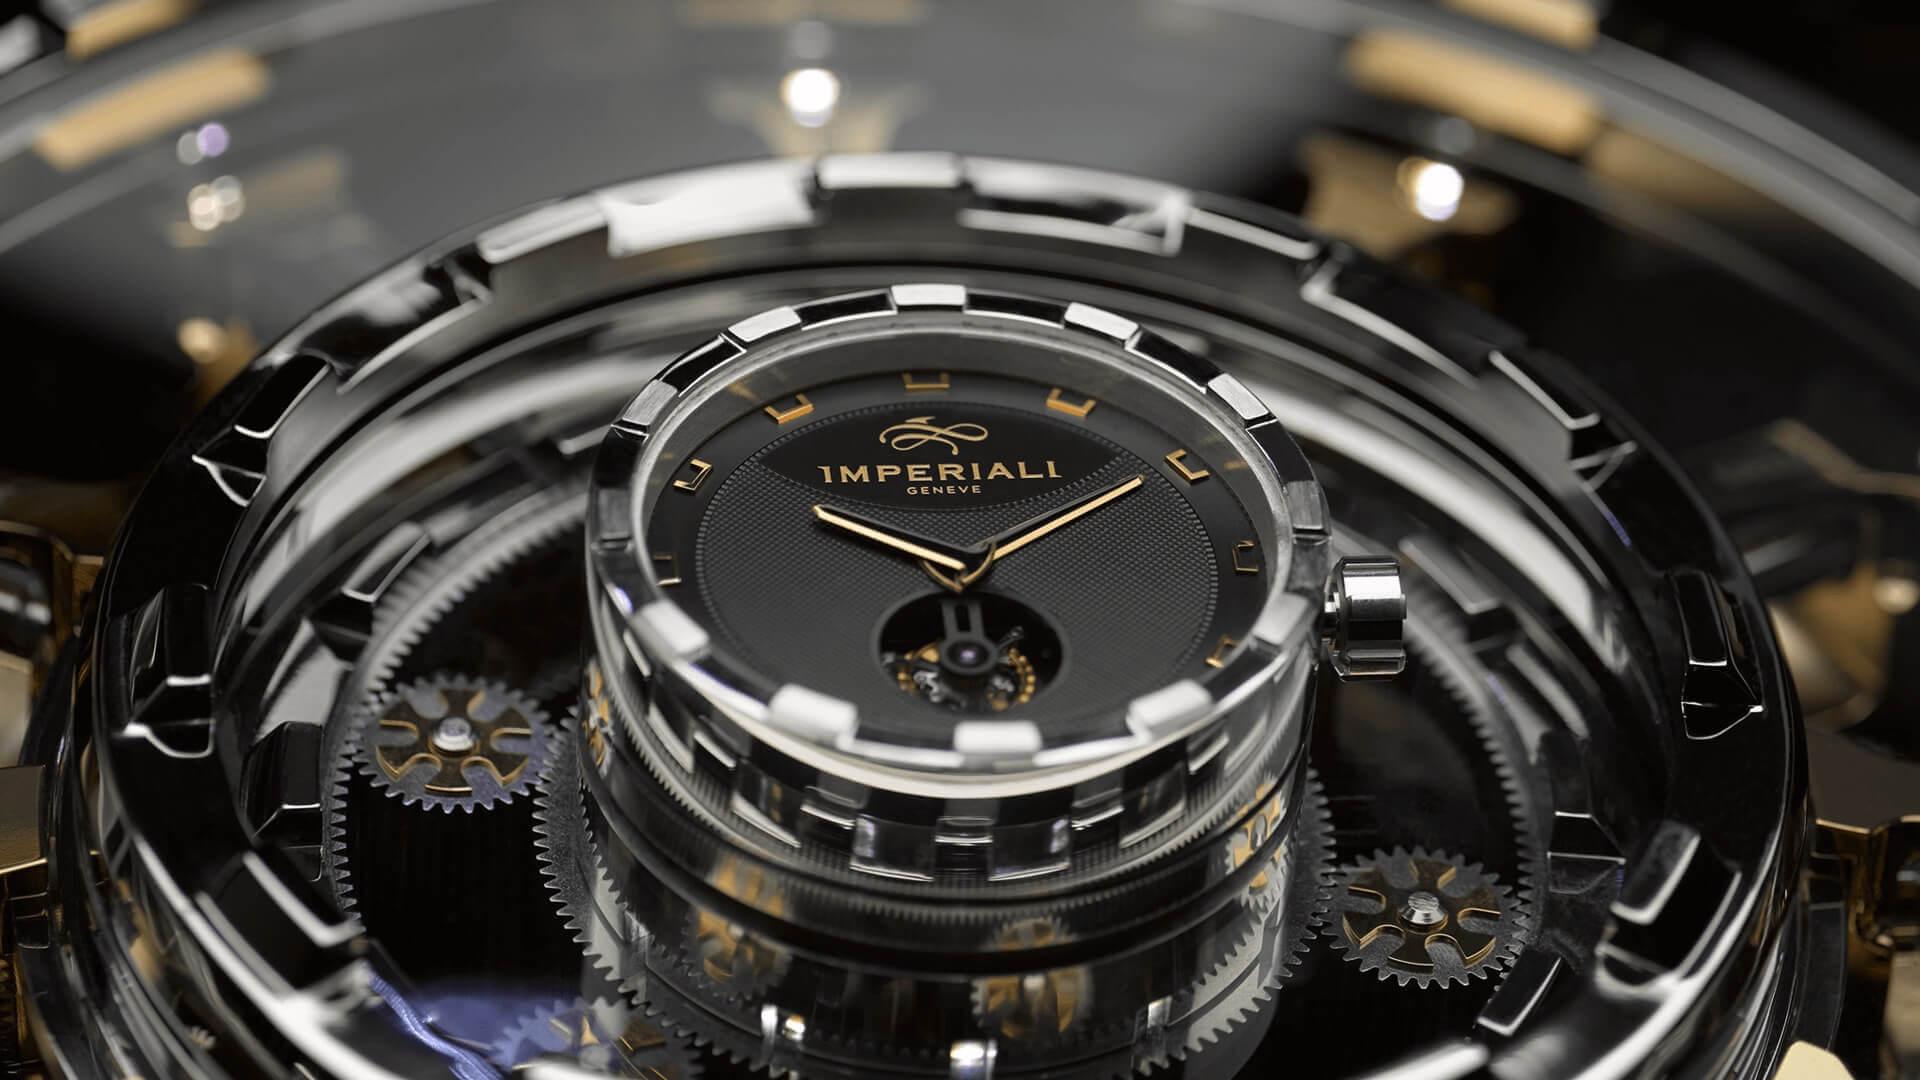 imperiali-geneve-emperador-cigares-cave-coupe-laser-tourbillon-luxe-design-horlogerie-effronté-03